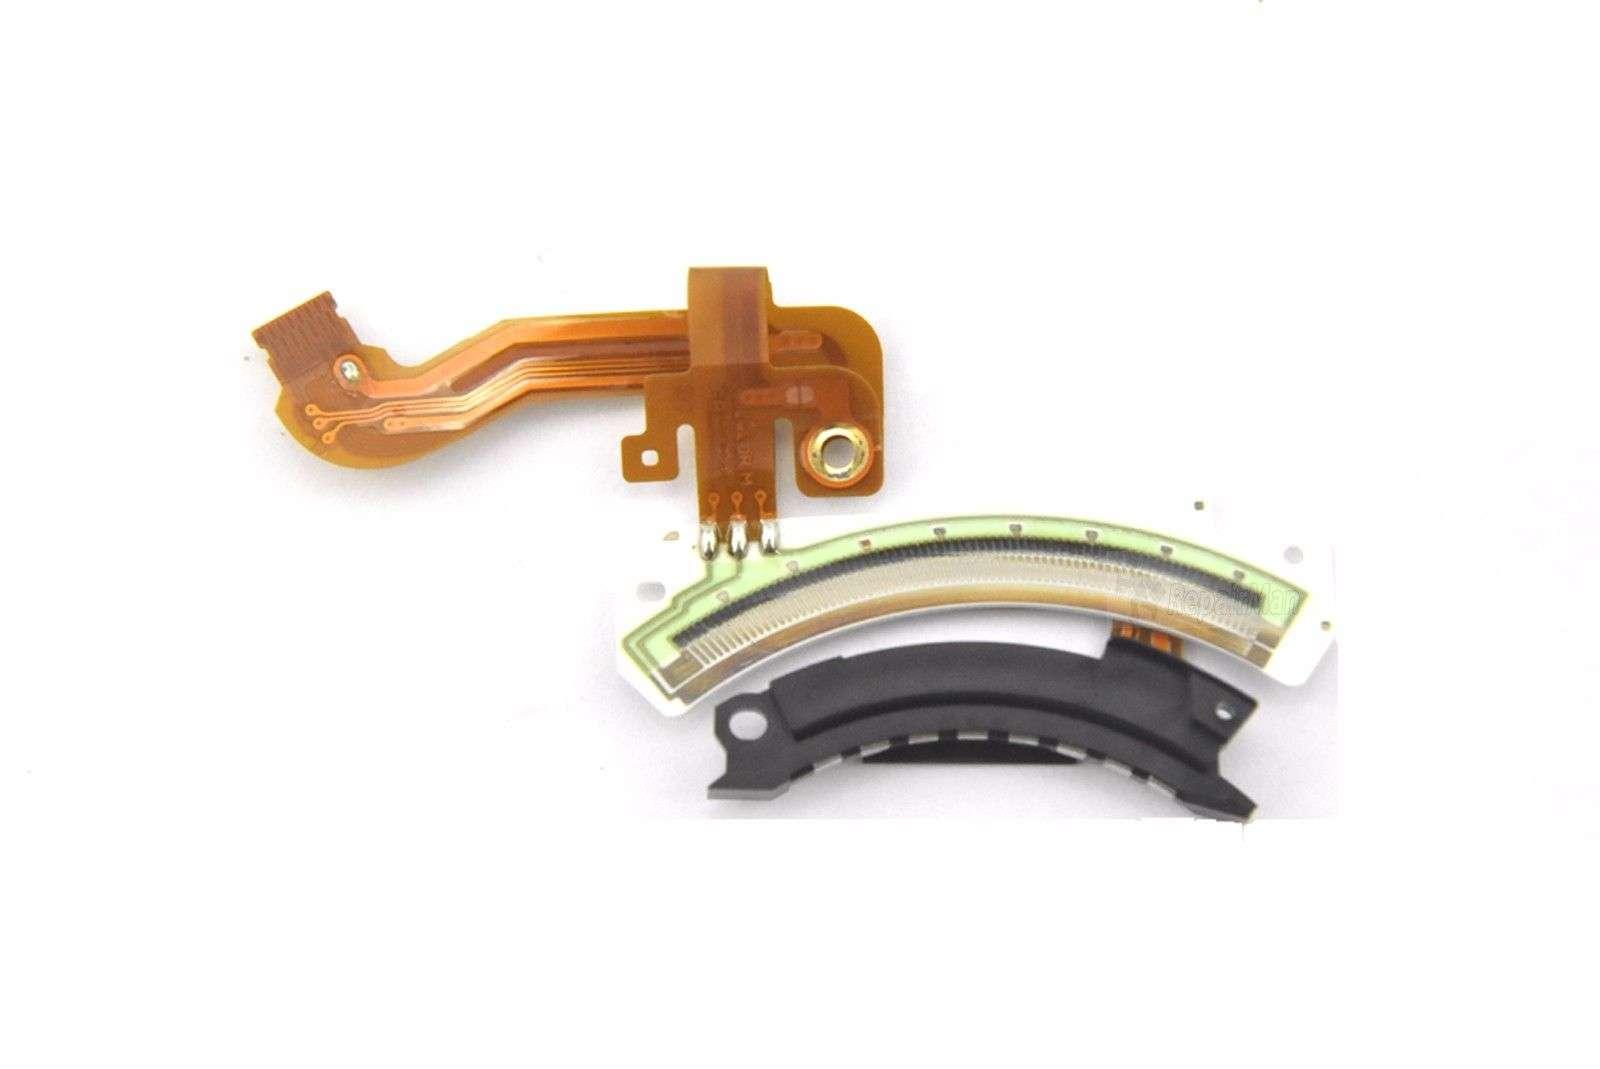 Nikon D610 Mirror Box Check Aperture F-fo Ceramic plate Repair Part